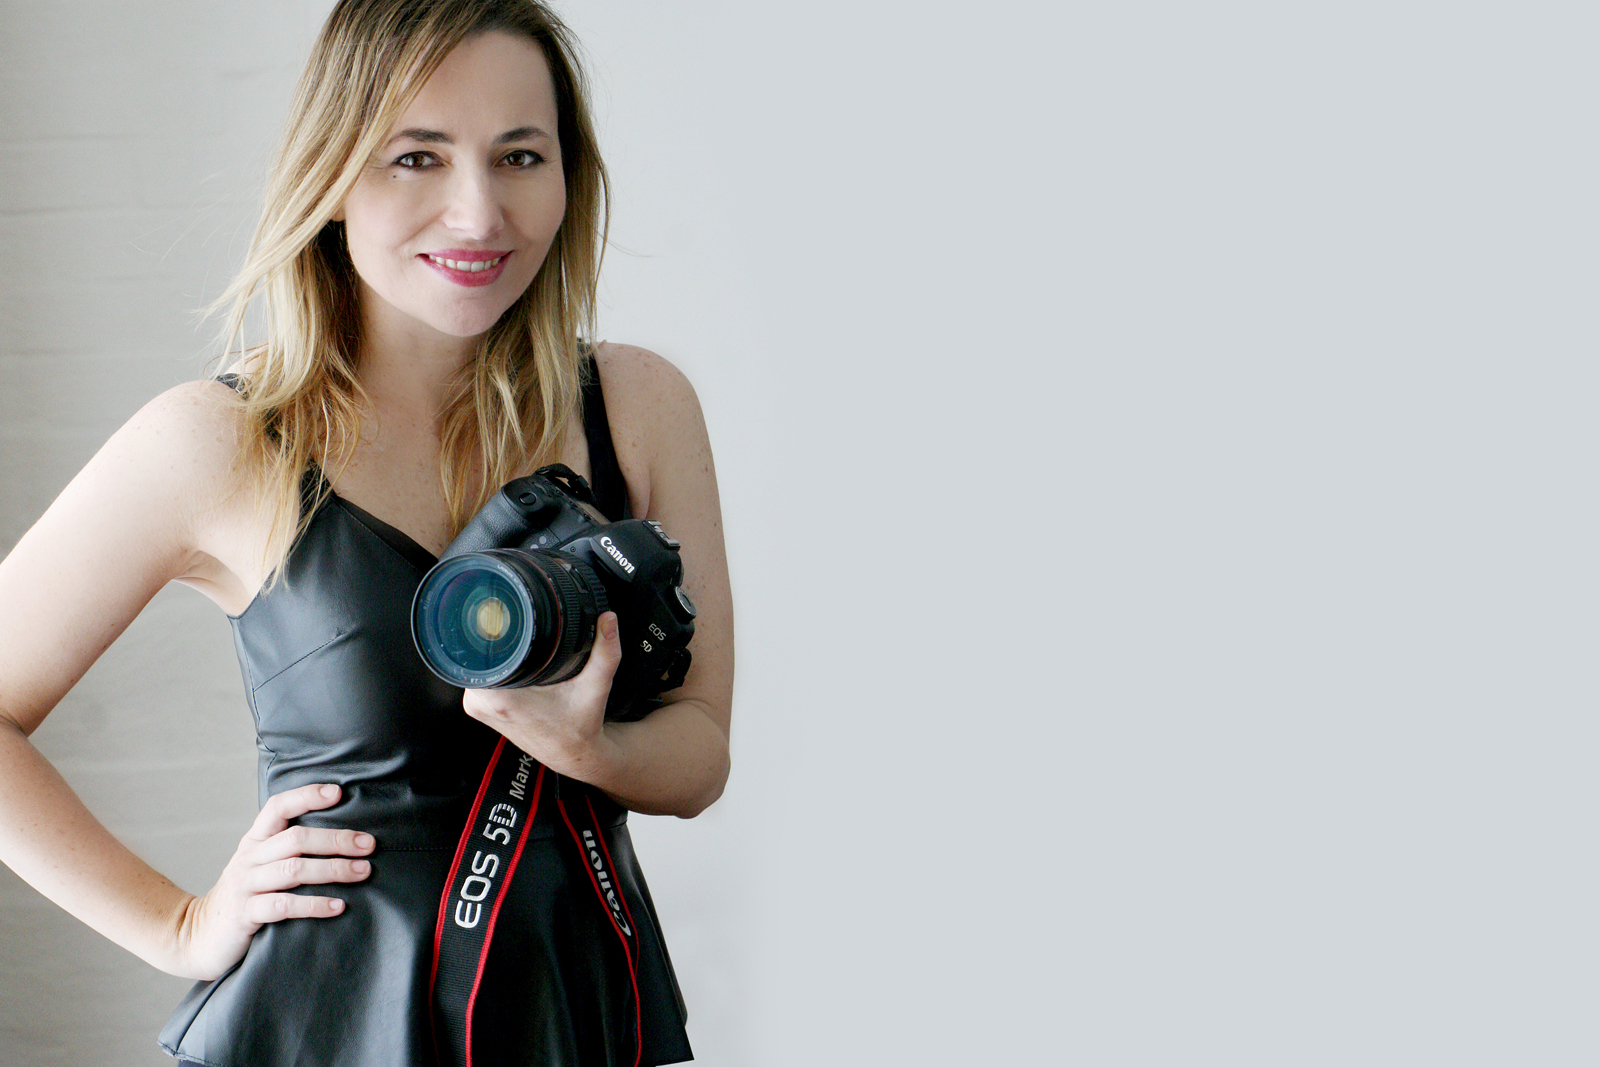 portrait photographer Catherine Leung